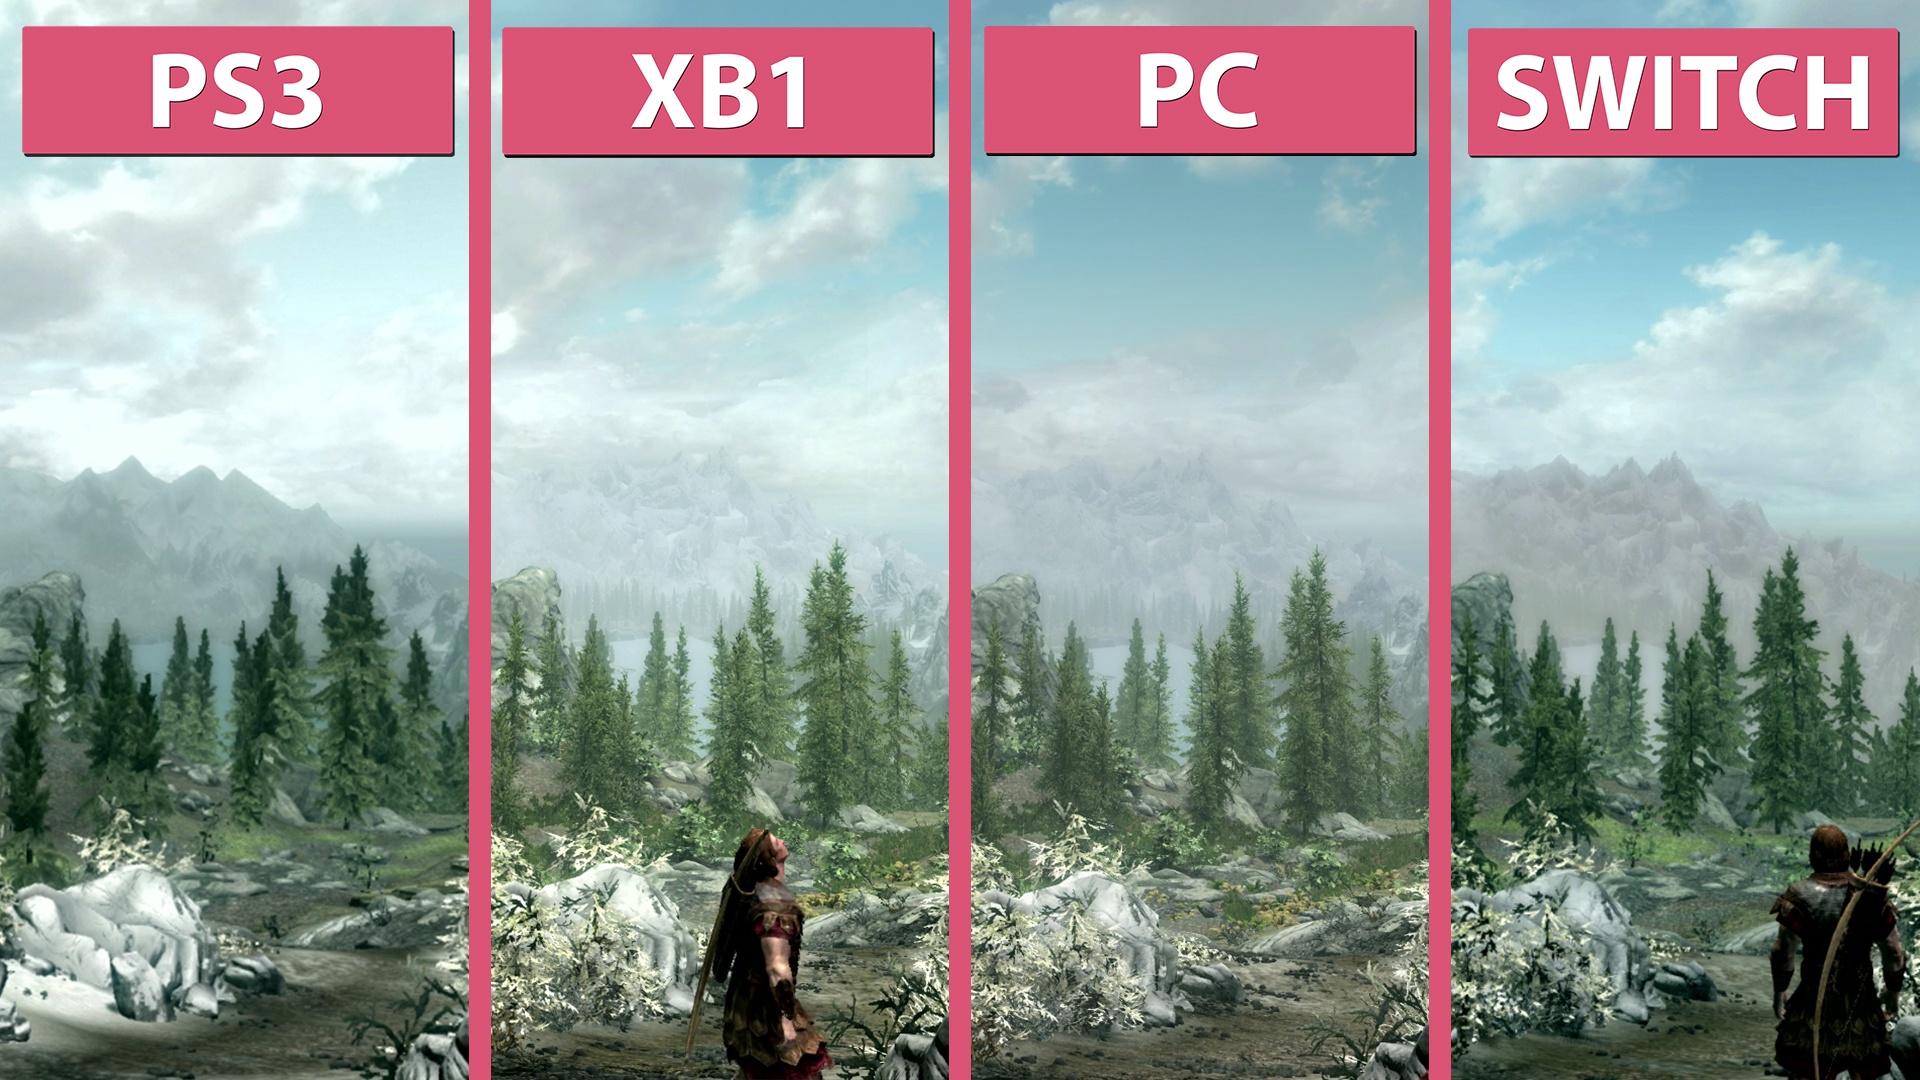 Skyrim Switch Gegen Ps3 Xbox One Und Pc Im Grafikvergleich Gamepro Sony Special Edition Ps4